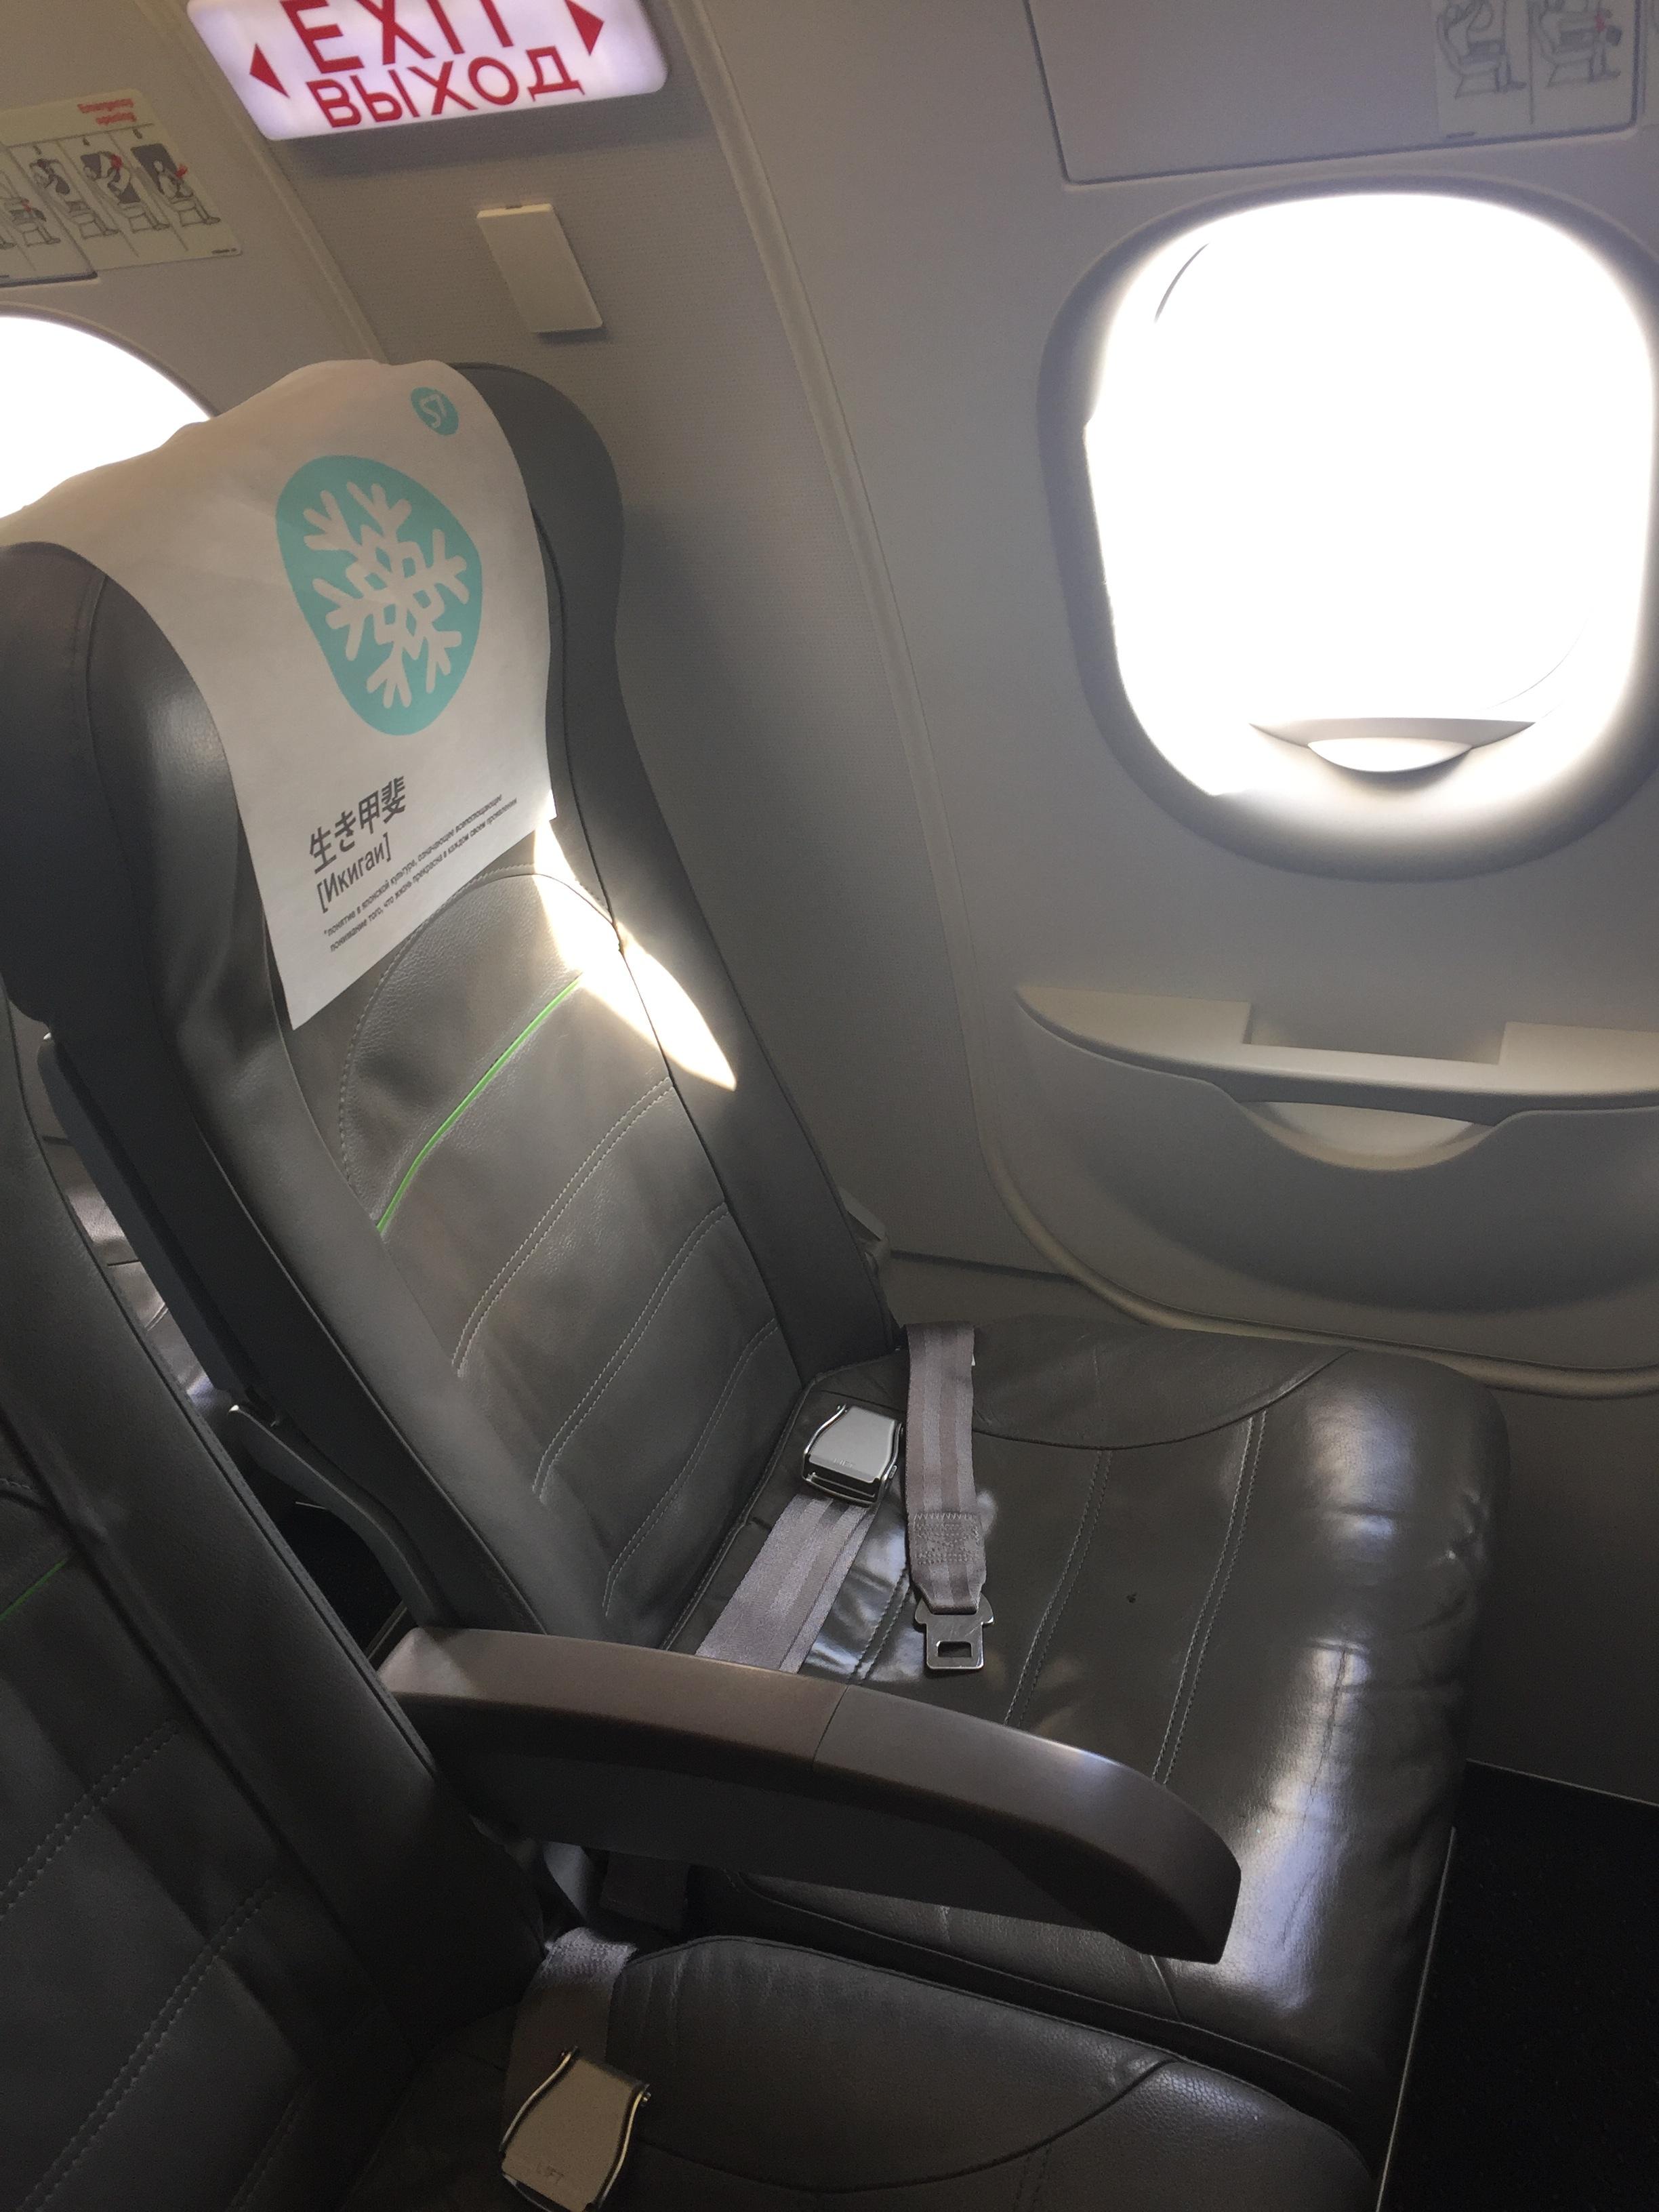 S7 airlines economy class.JPG